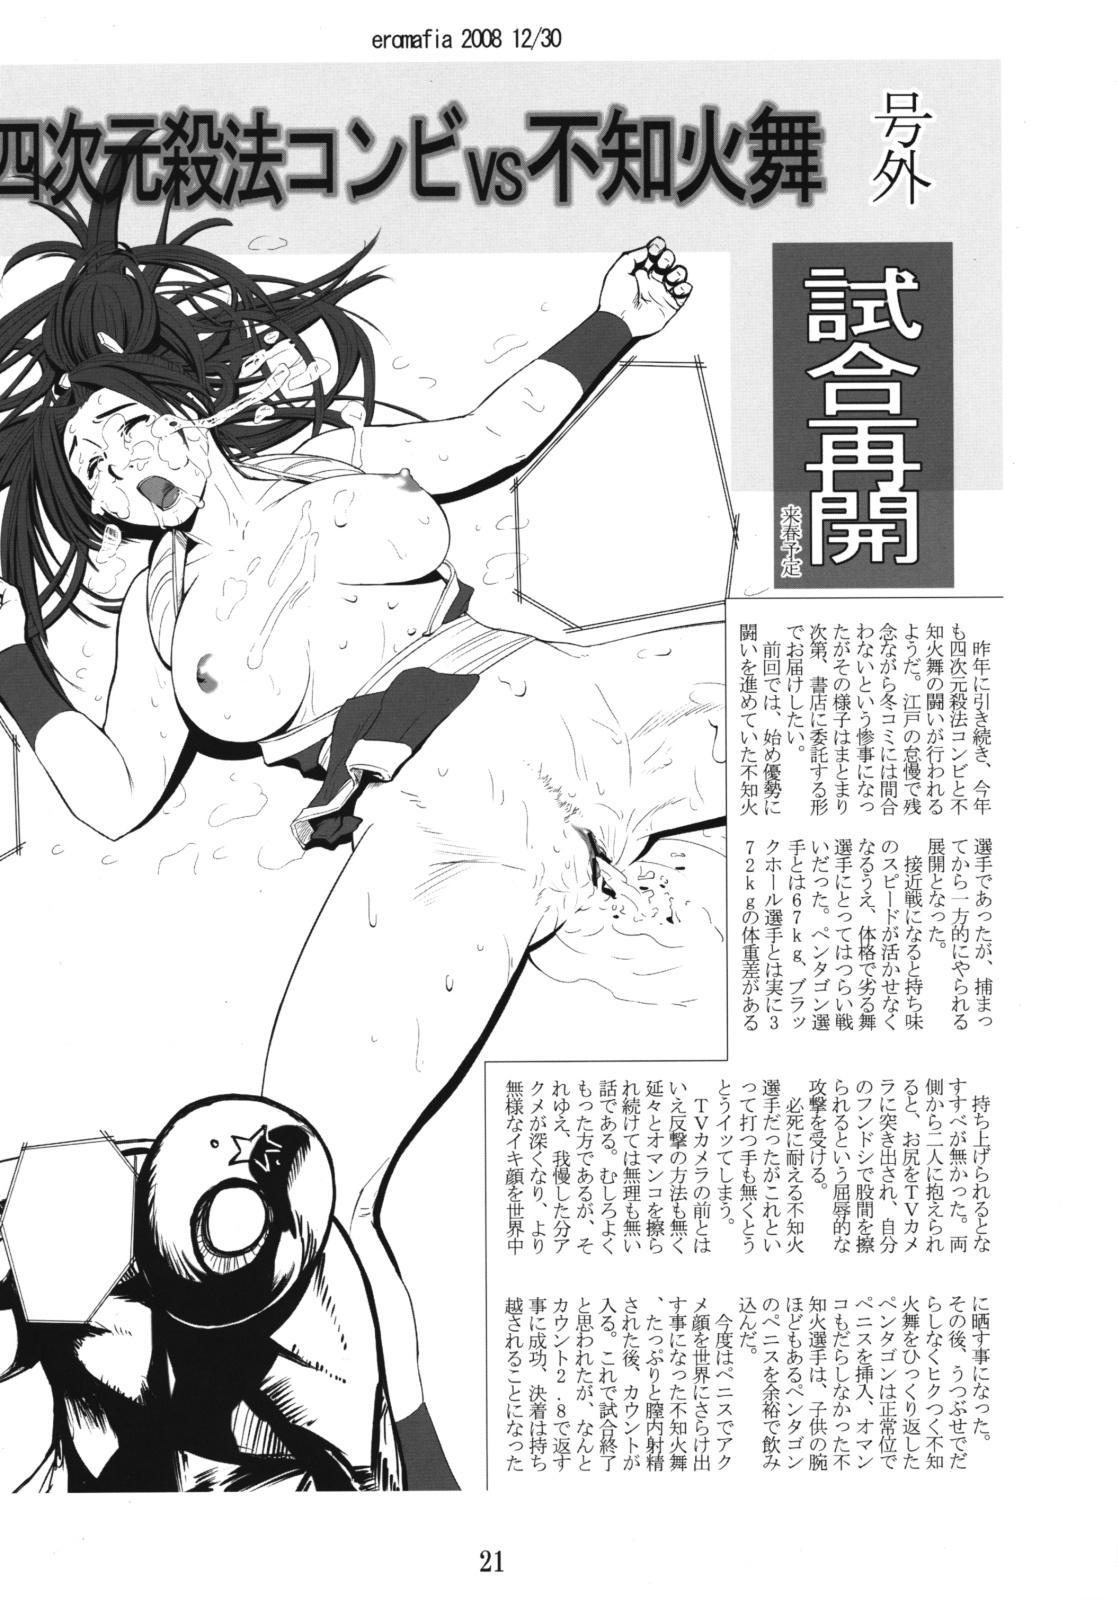 Yojigen Sappou Combi vs Shiranui Mai Round 2 19